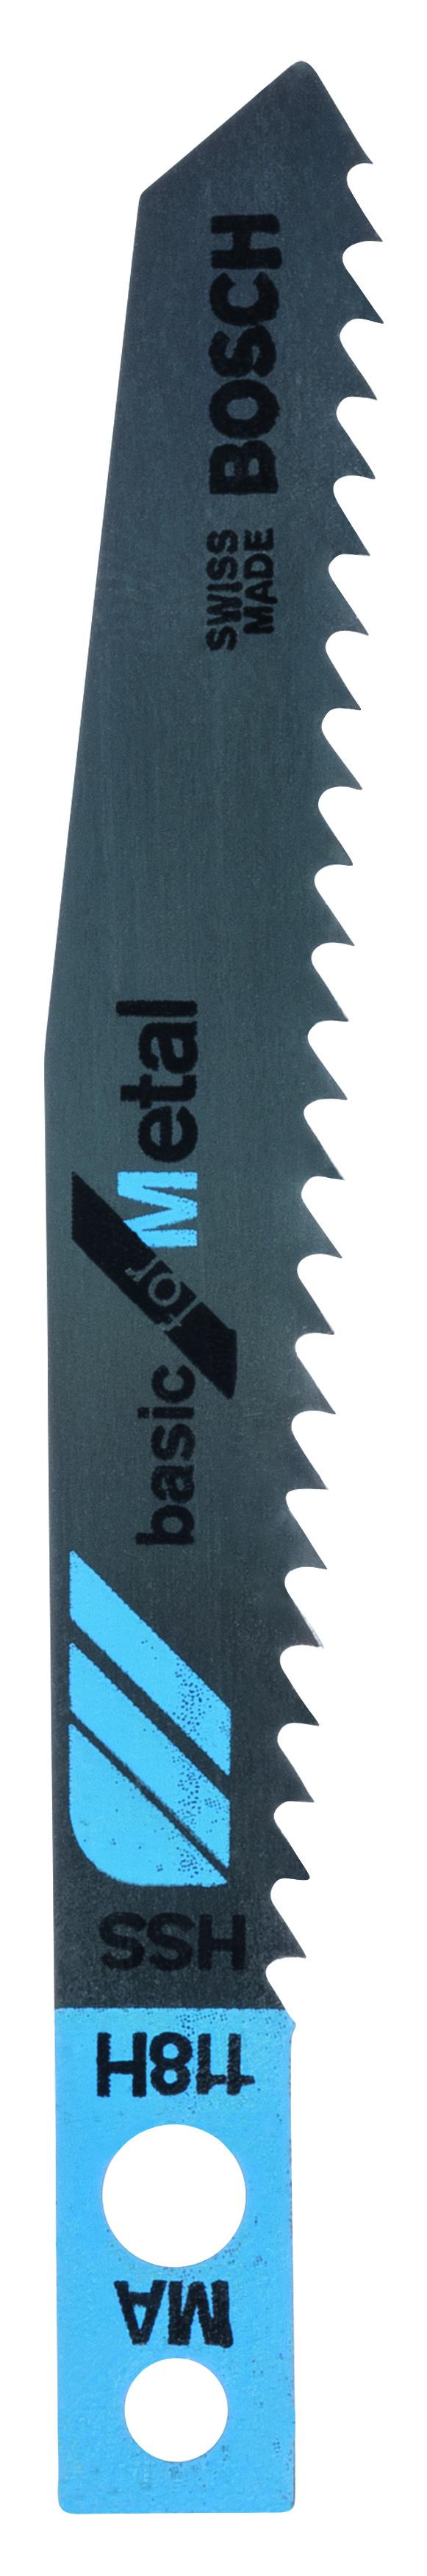 Image of   Stiksavklinge MA 118 H Basic for Metal